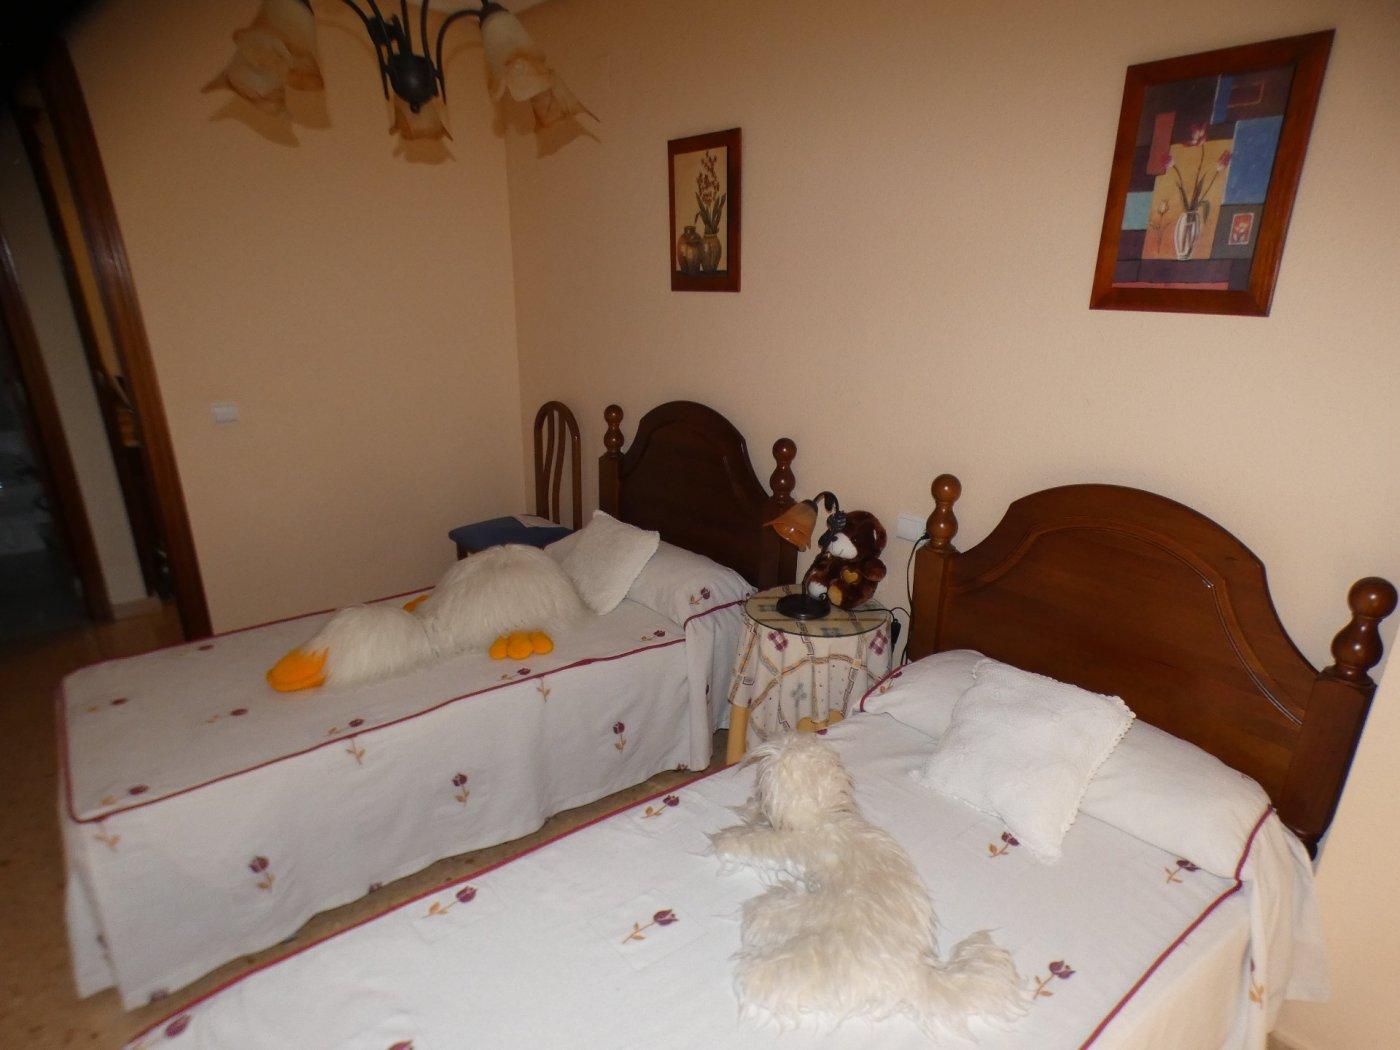 Piso 4 dormitorios tombola - imagenInmueble8